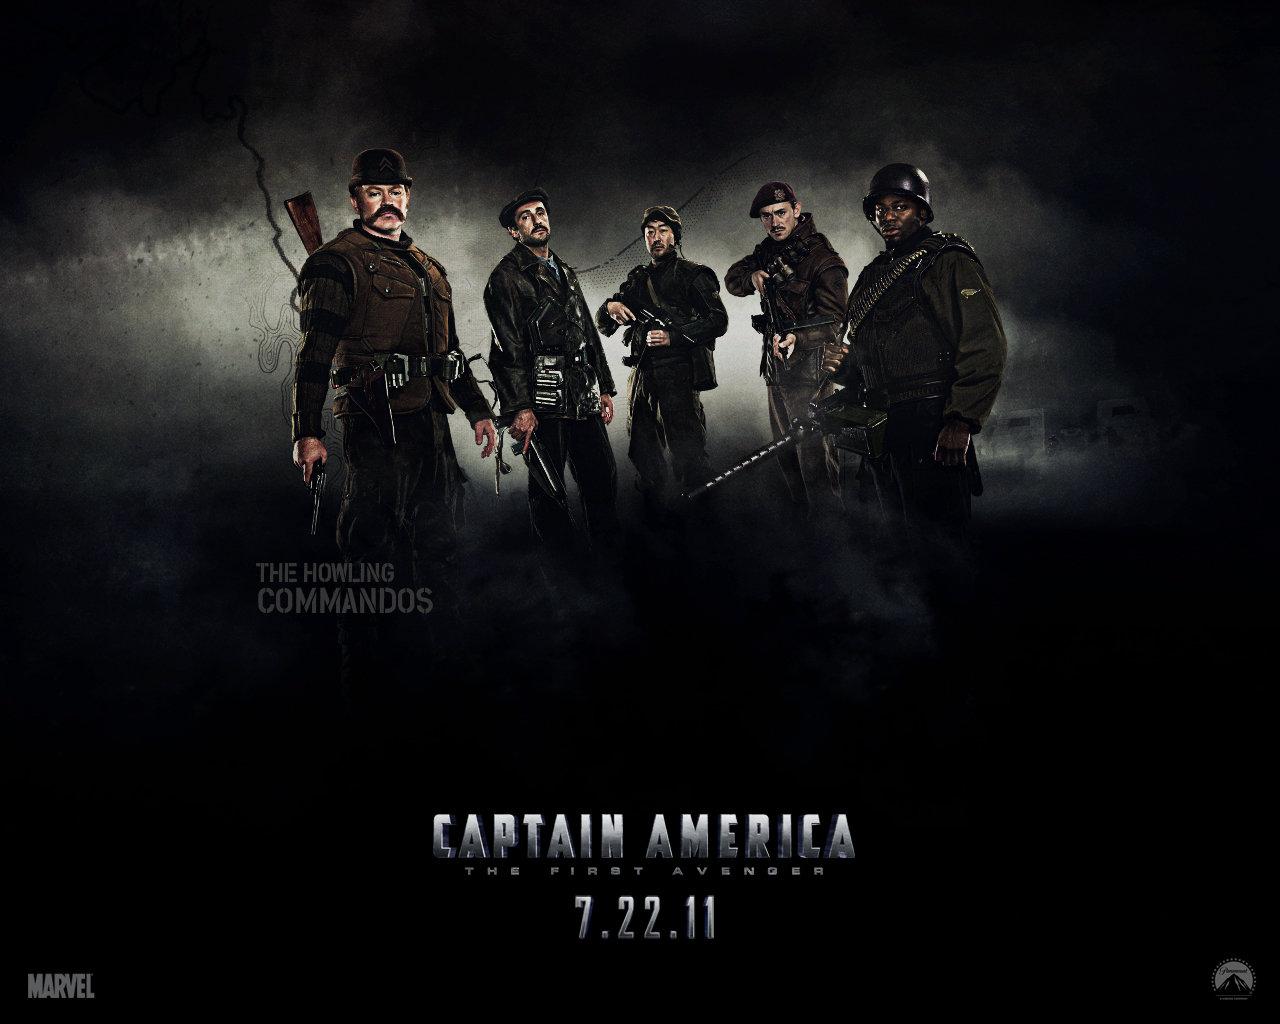 Download Hd 1280x1024 Captain America The First Avenger Desktop